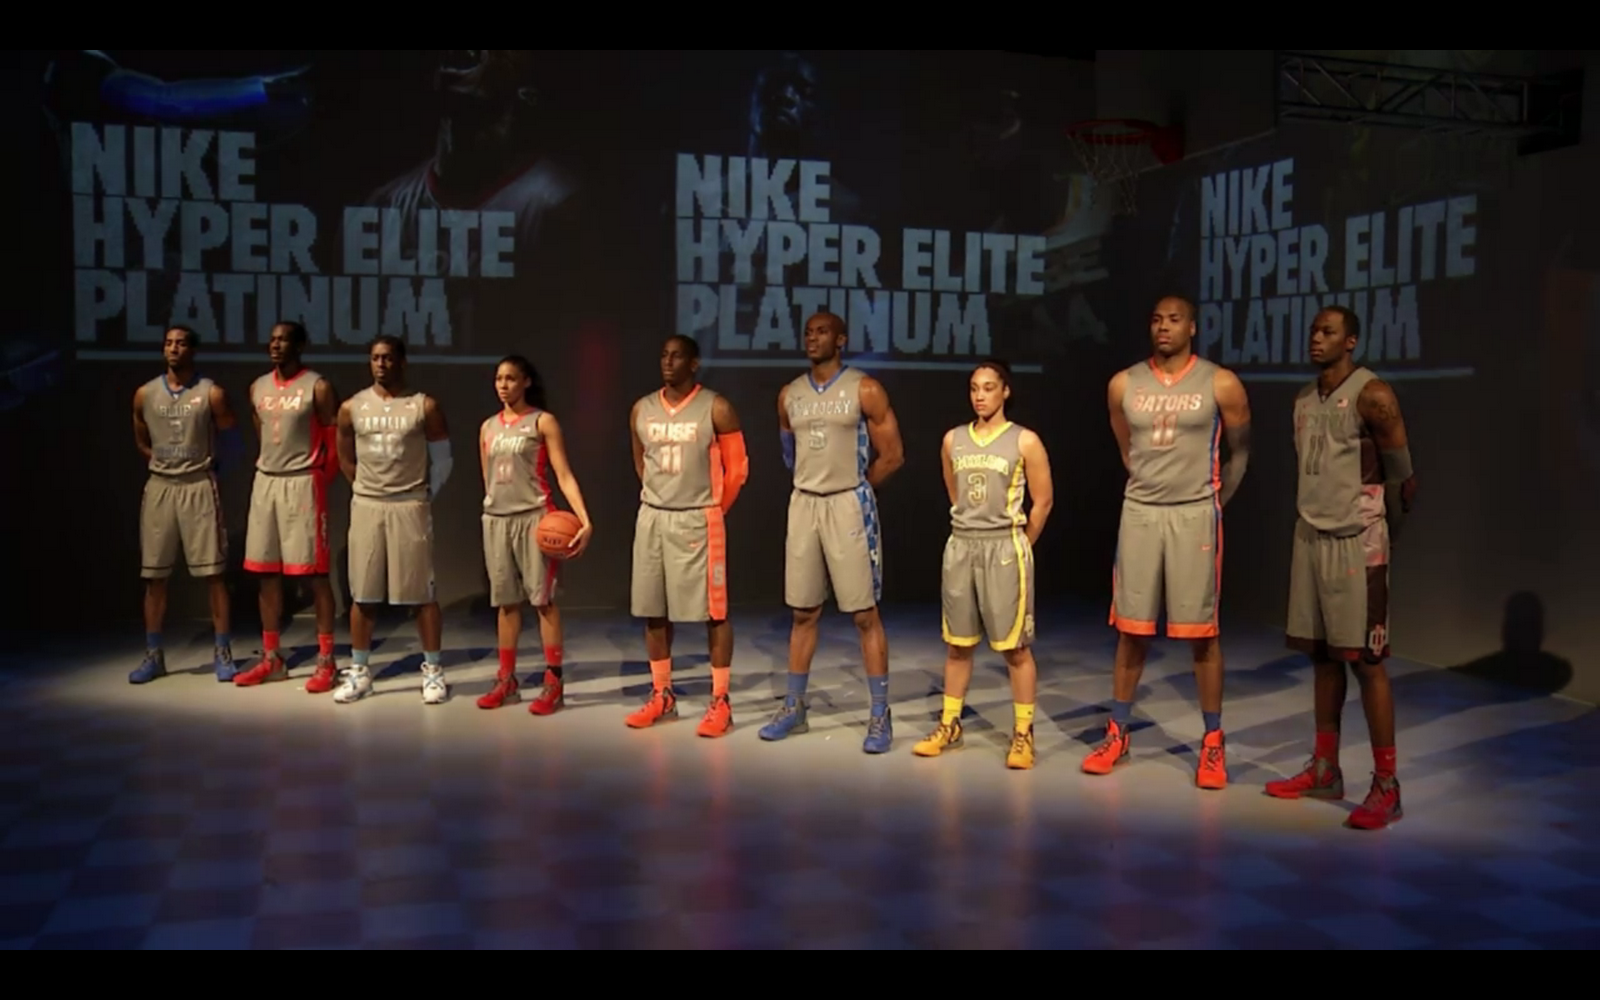 Nike Presenta Uniformes Hyper Elite Platinum De Nueve Equipos